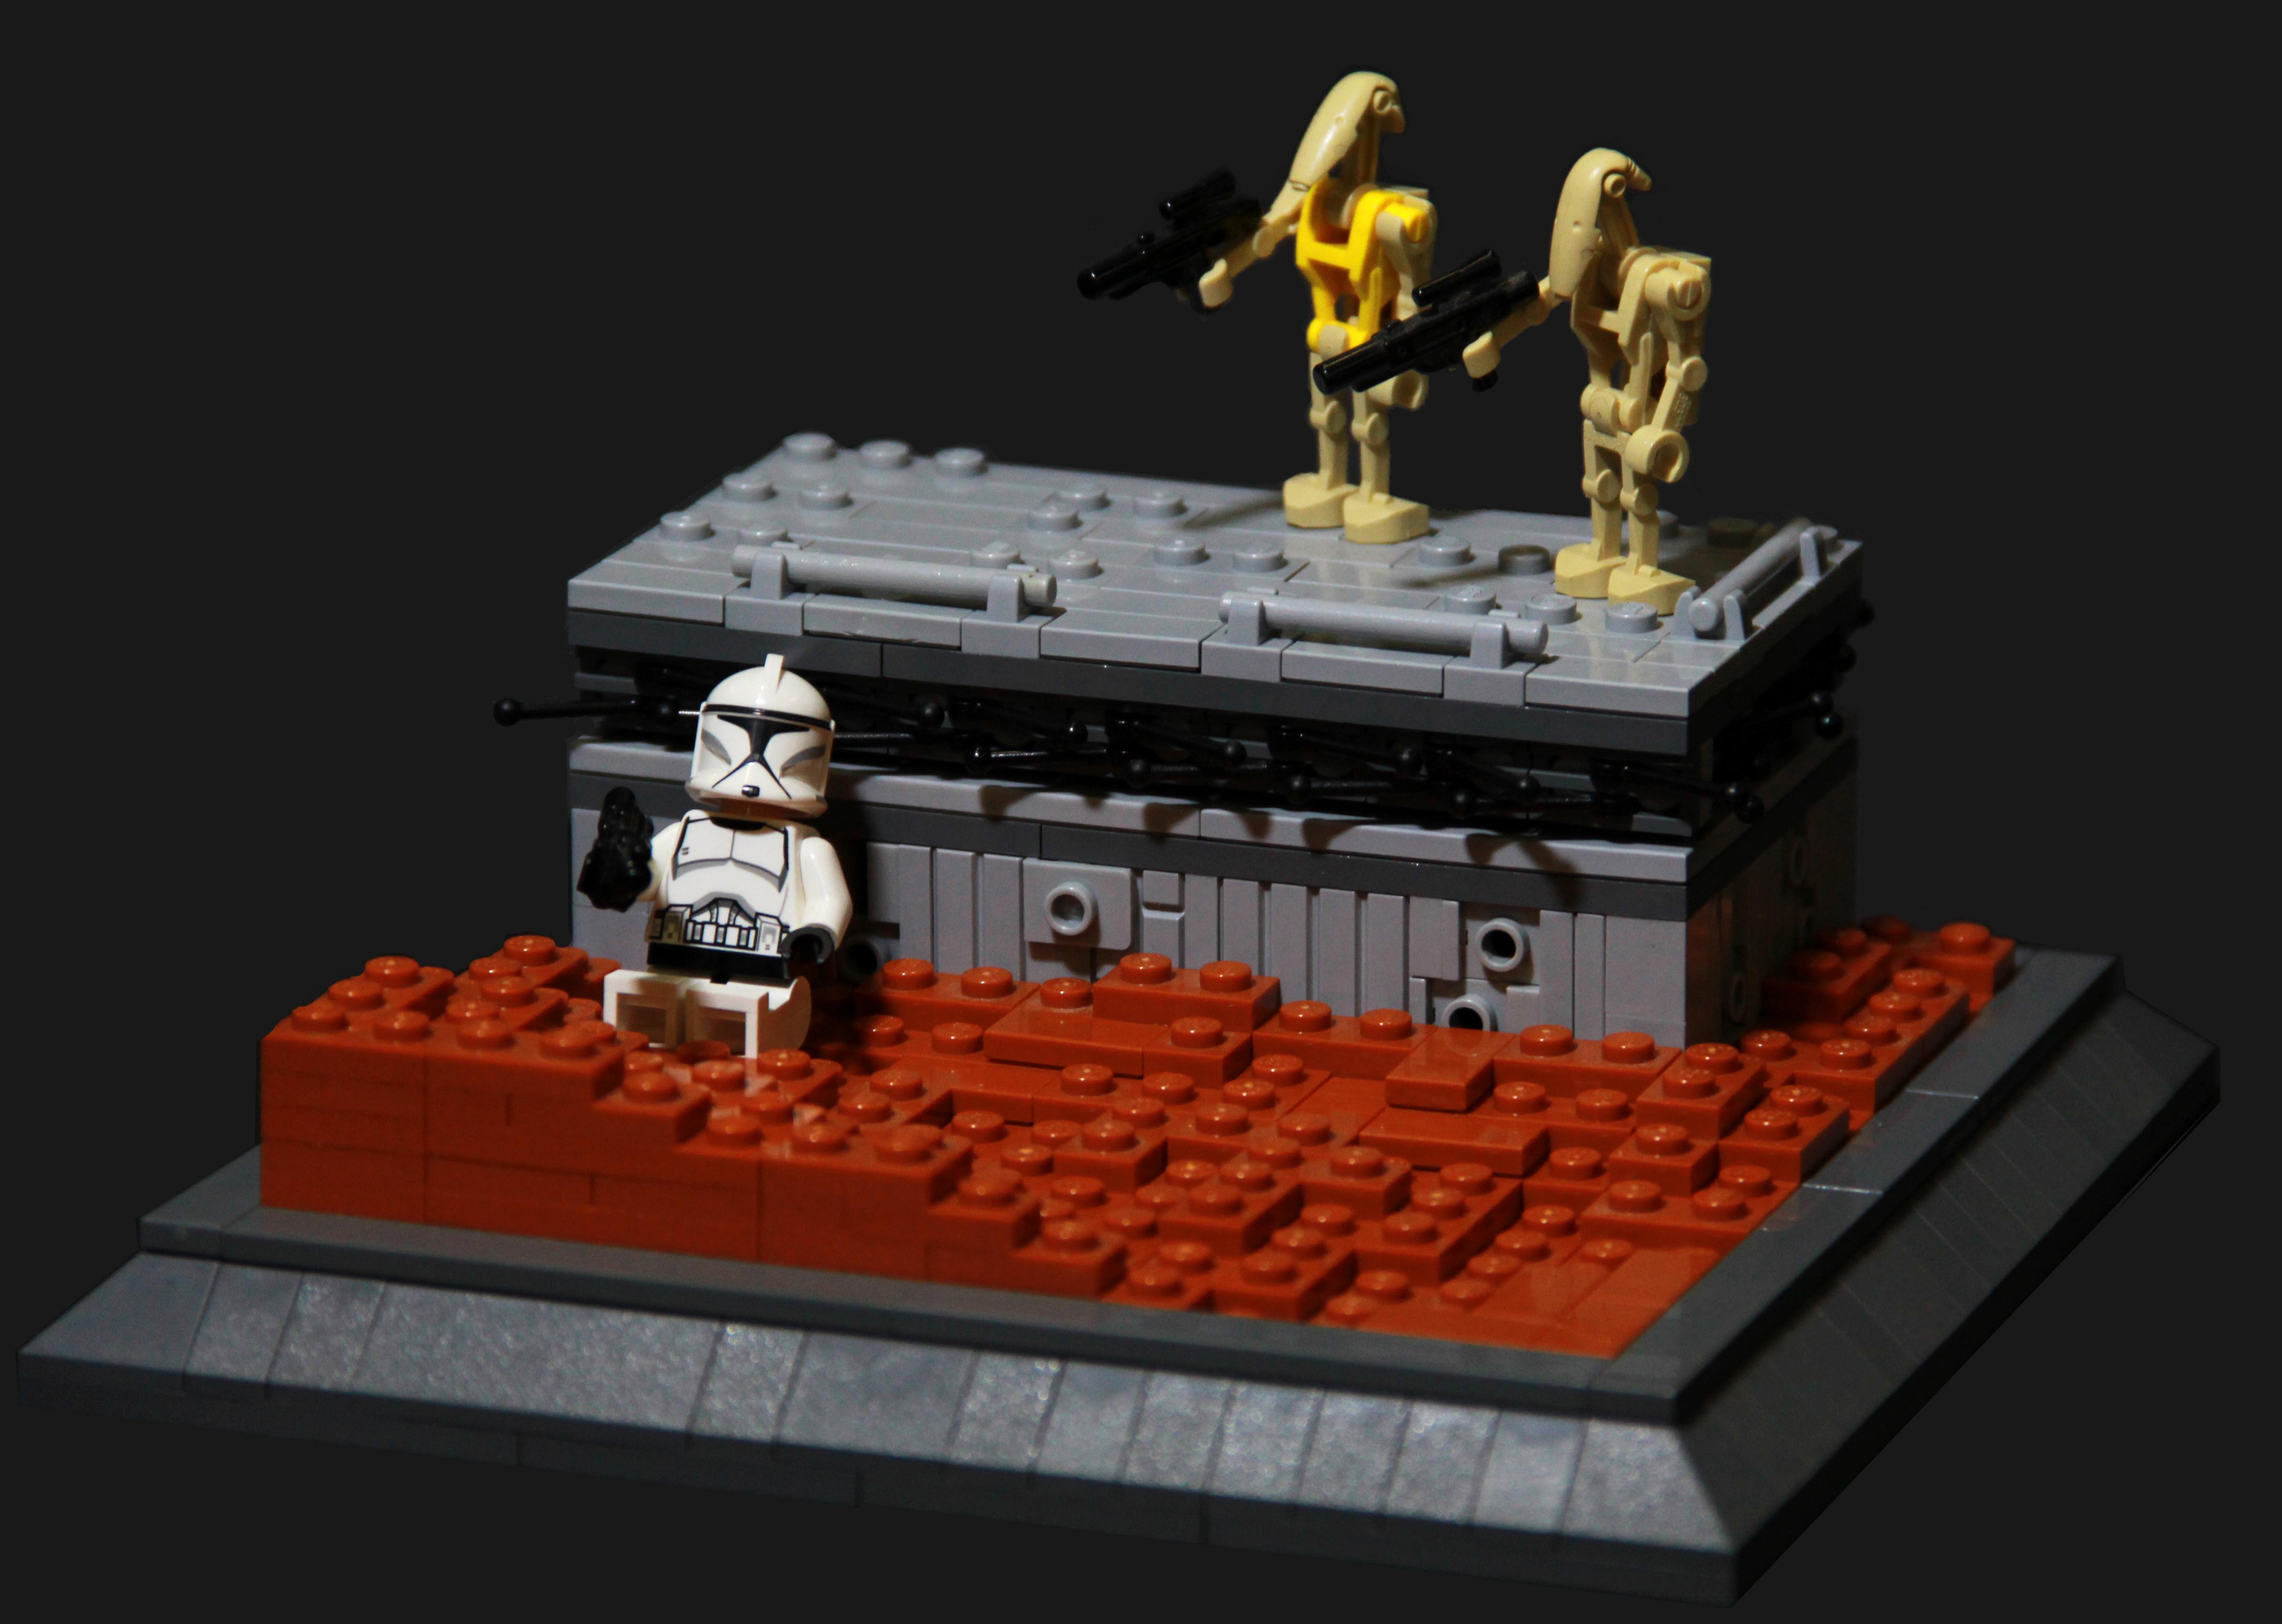 Hintergrundbilder : 2, Orange, Trooper, dunkel, Star, LEGO, Waffe ...